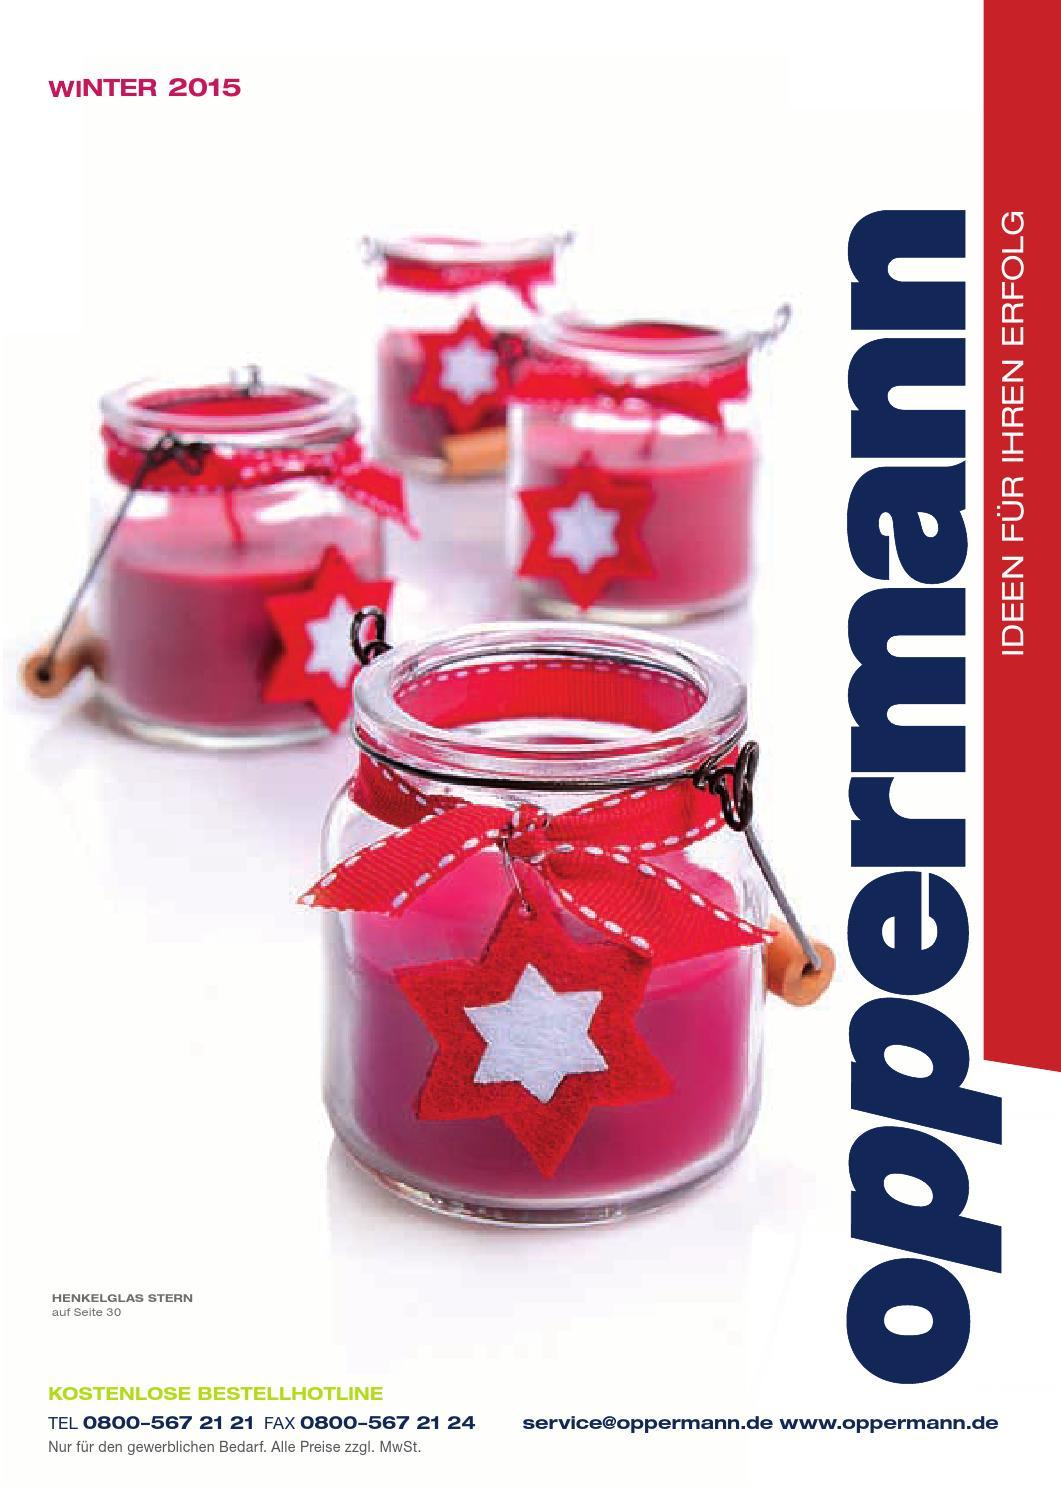 Rentier Bügelbild aufbügeln A4 A5 A6 Applikation color Weihnachten Motive süß